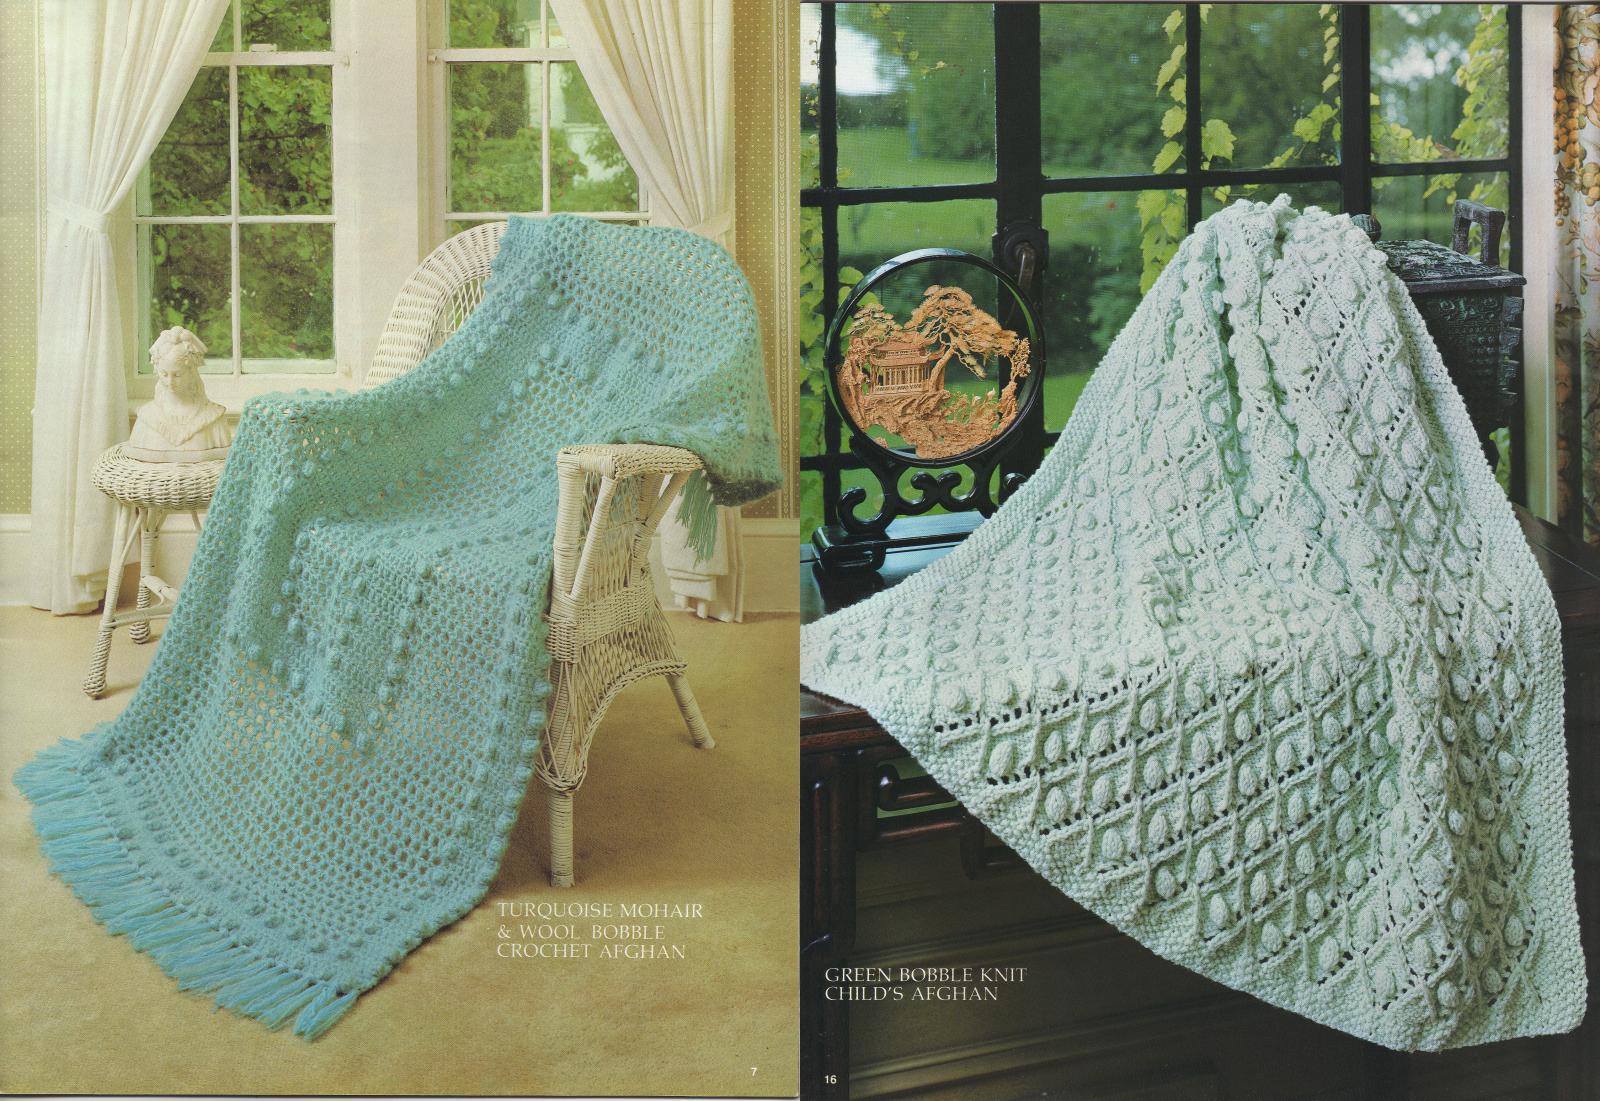 Image - 8000300 4 10.jpg Knitting and Crochet Pattern Archive Wiki FANDOM...